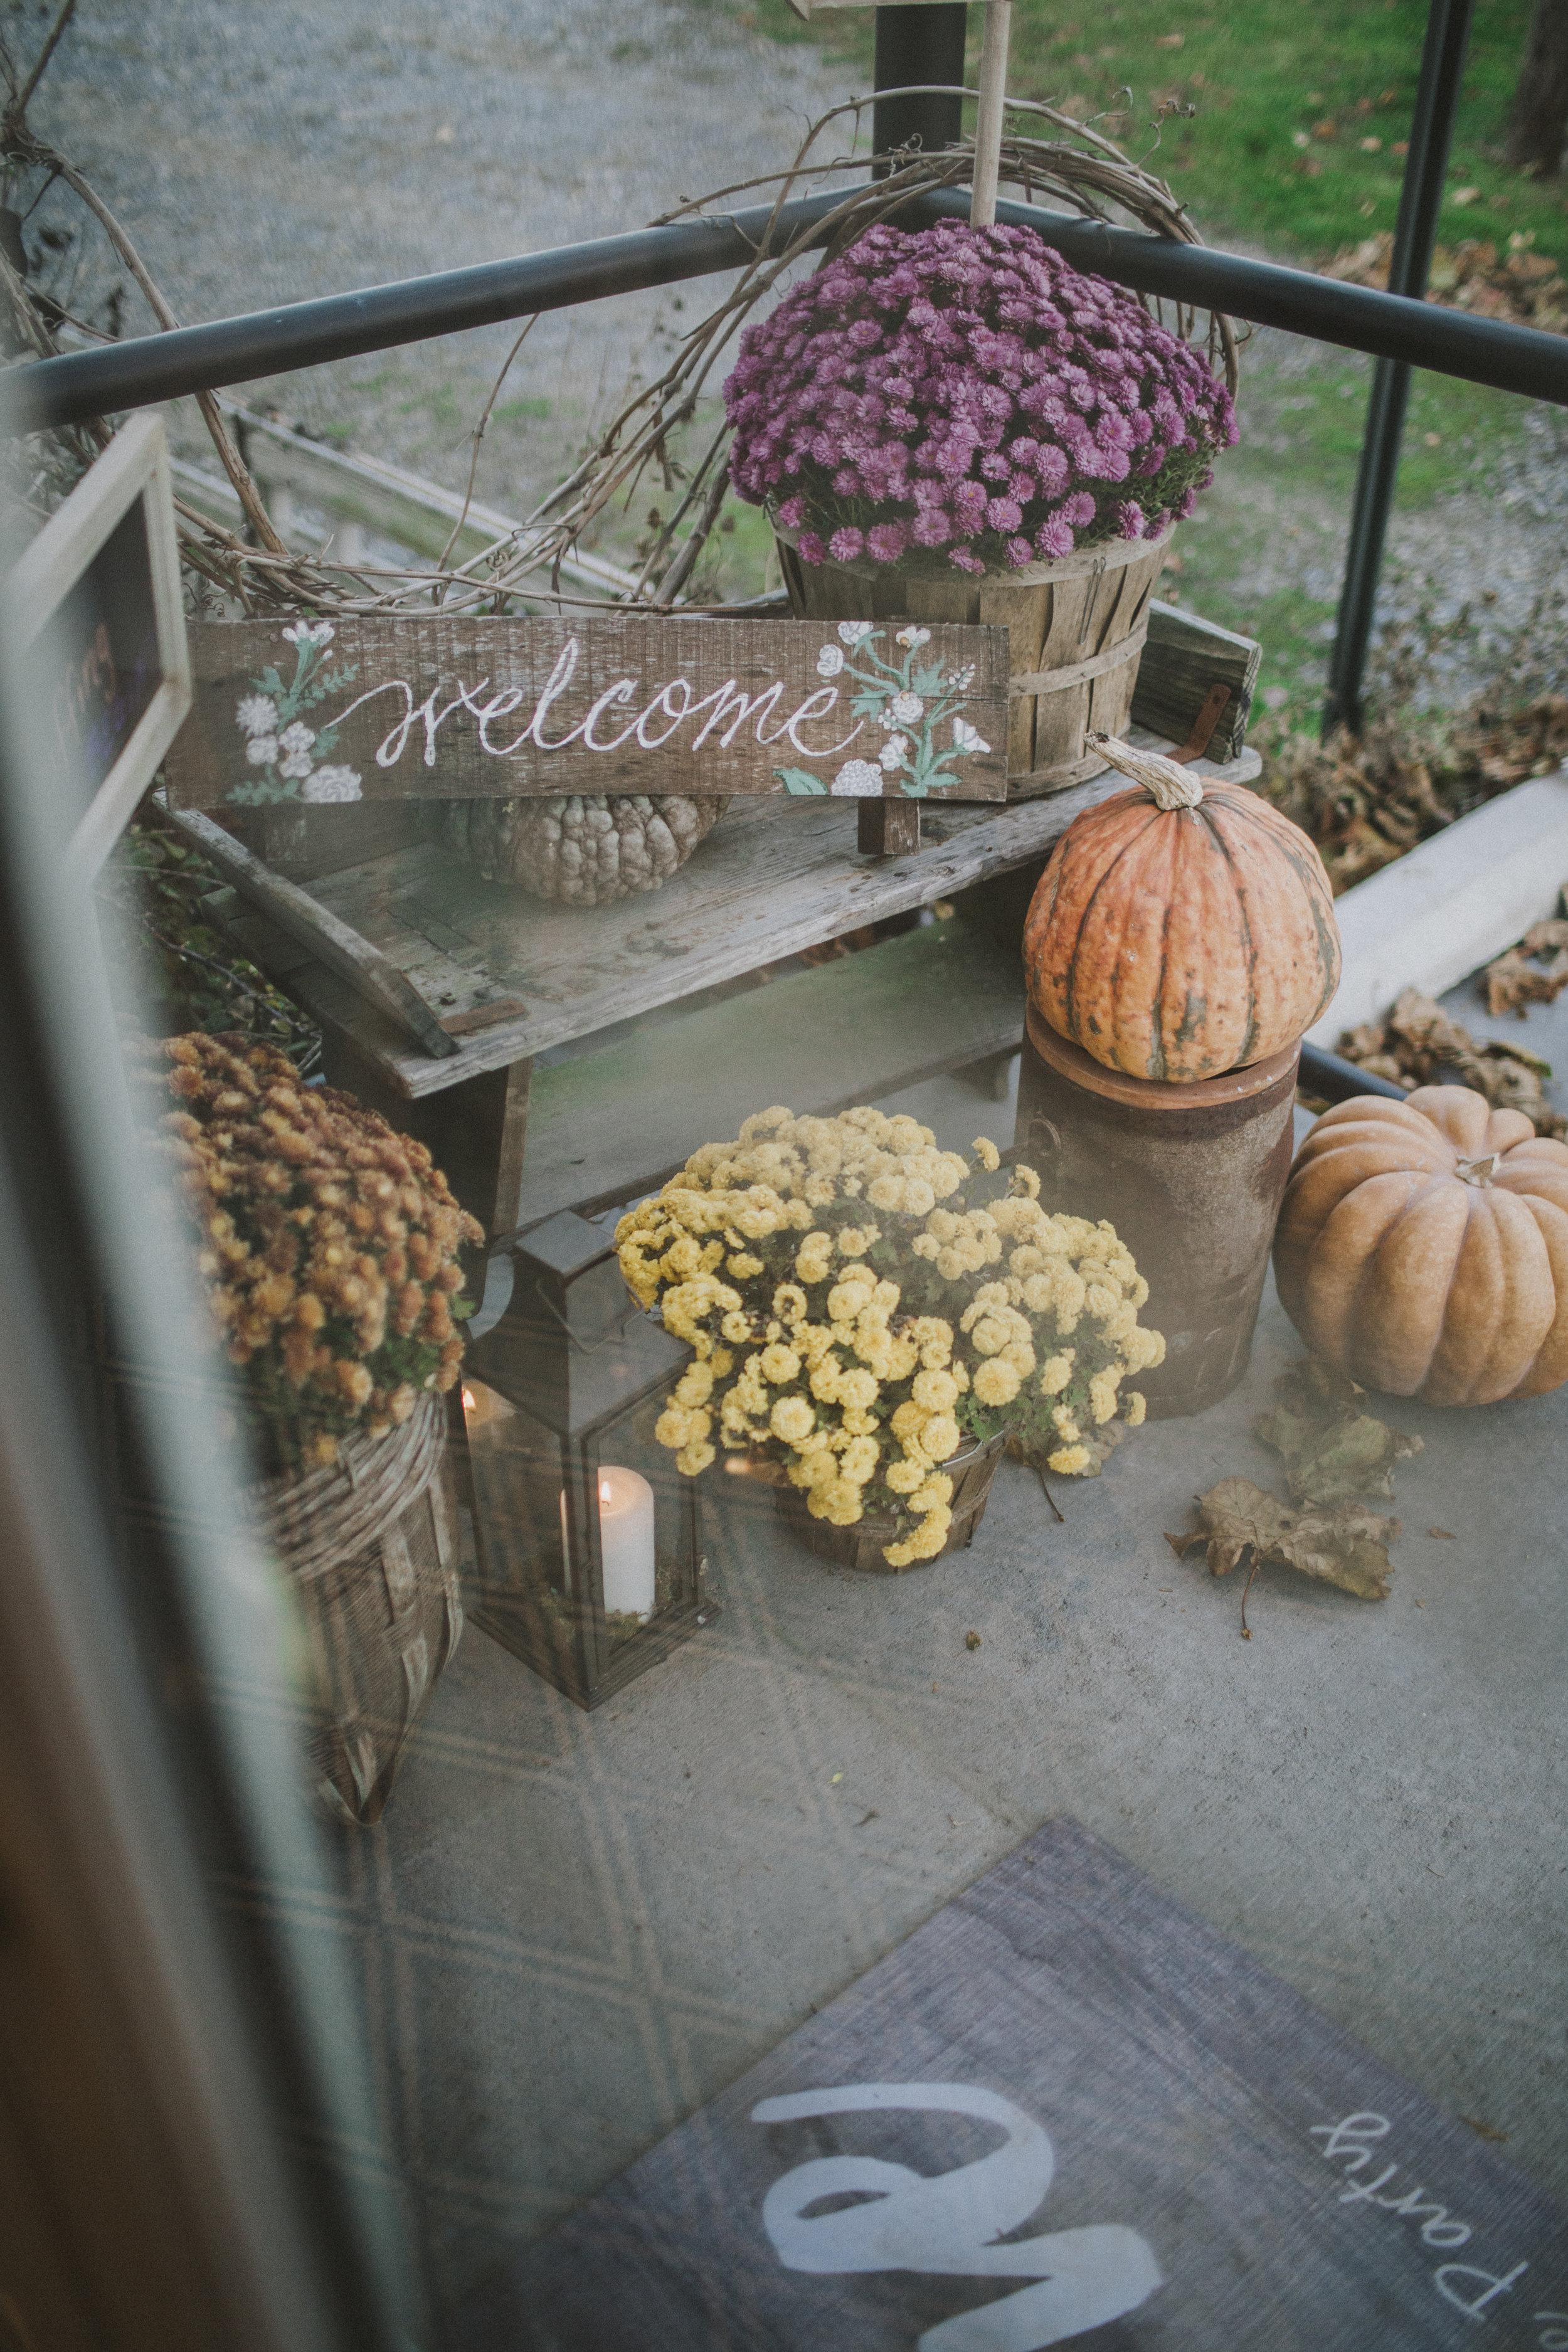 seasonal decor included